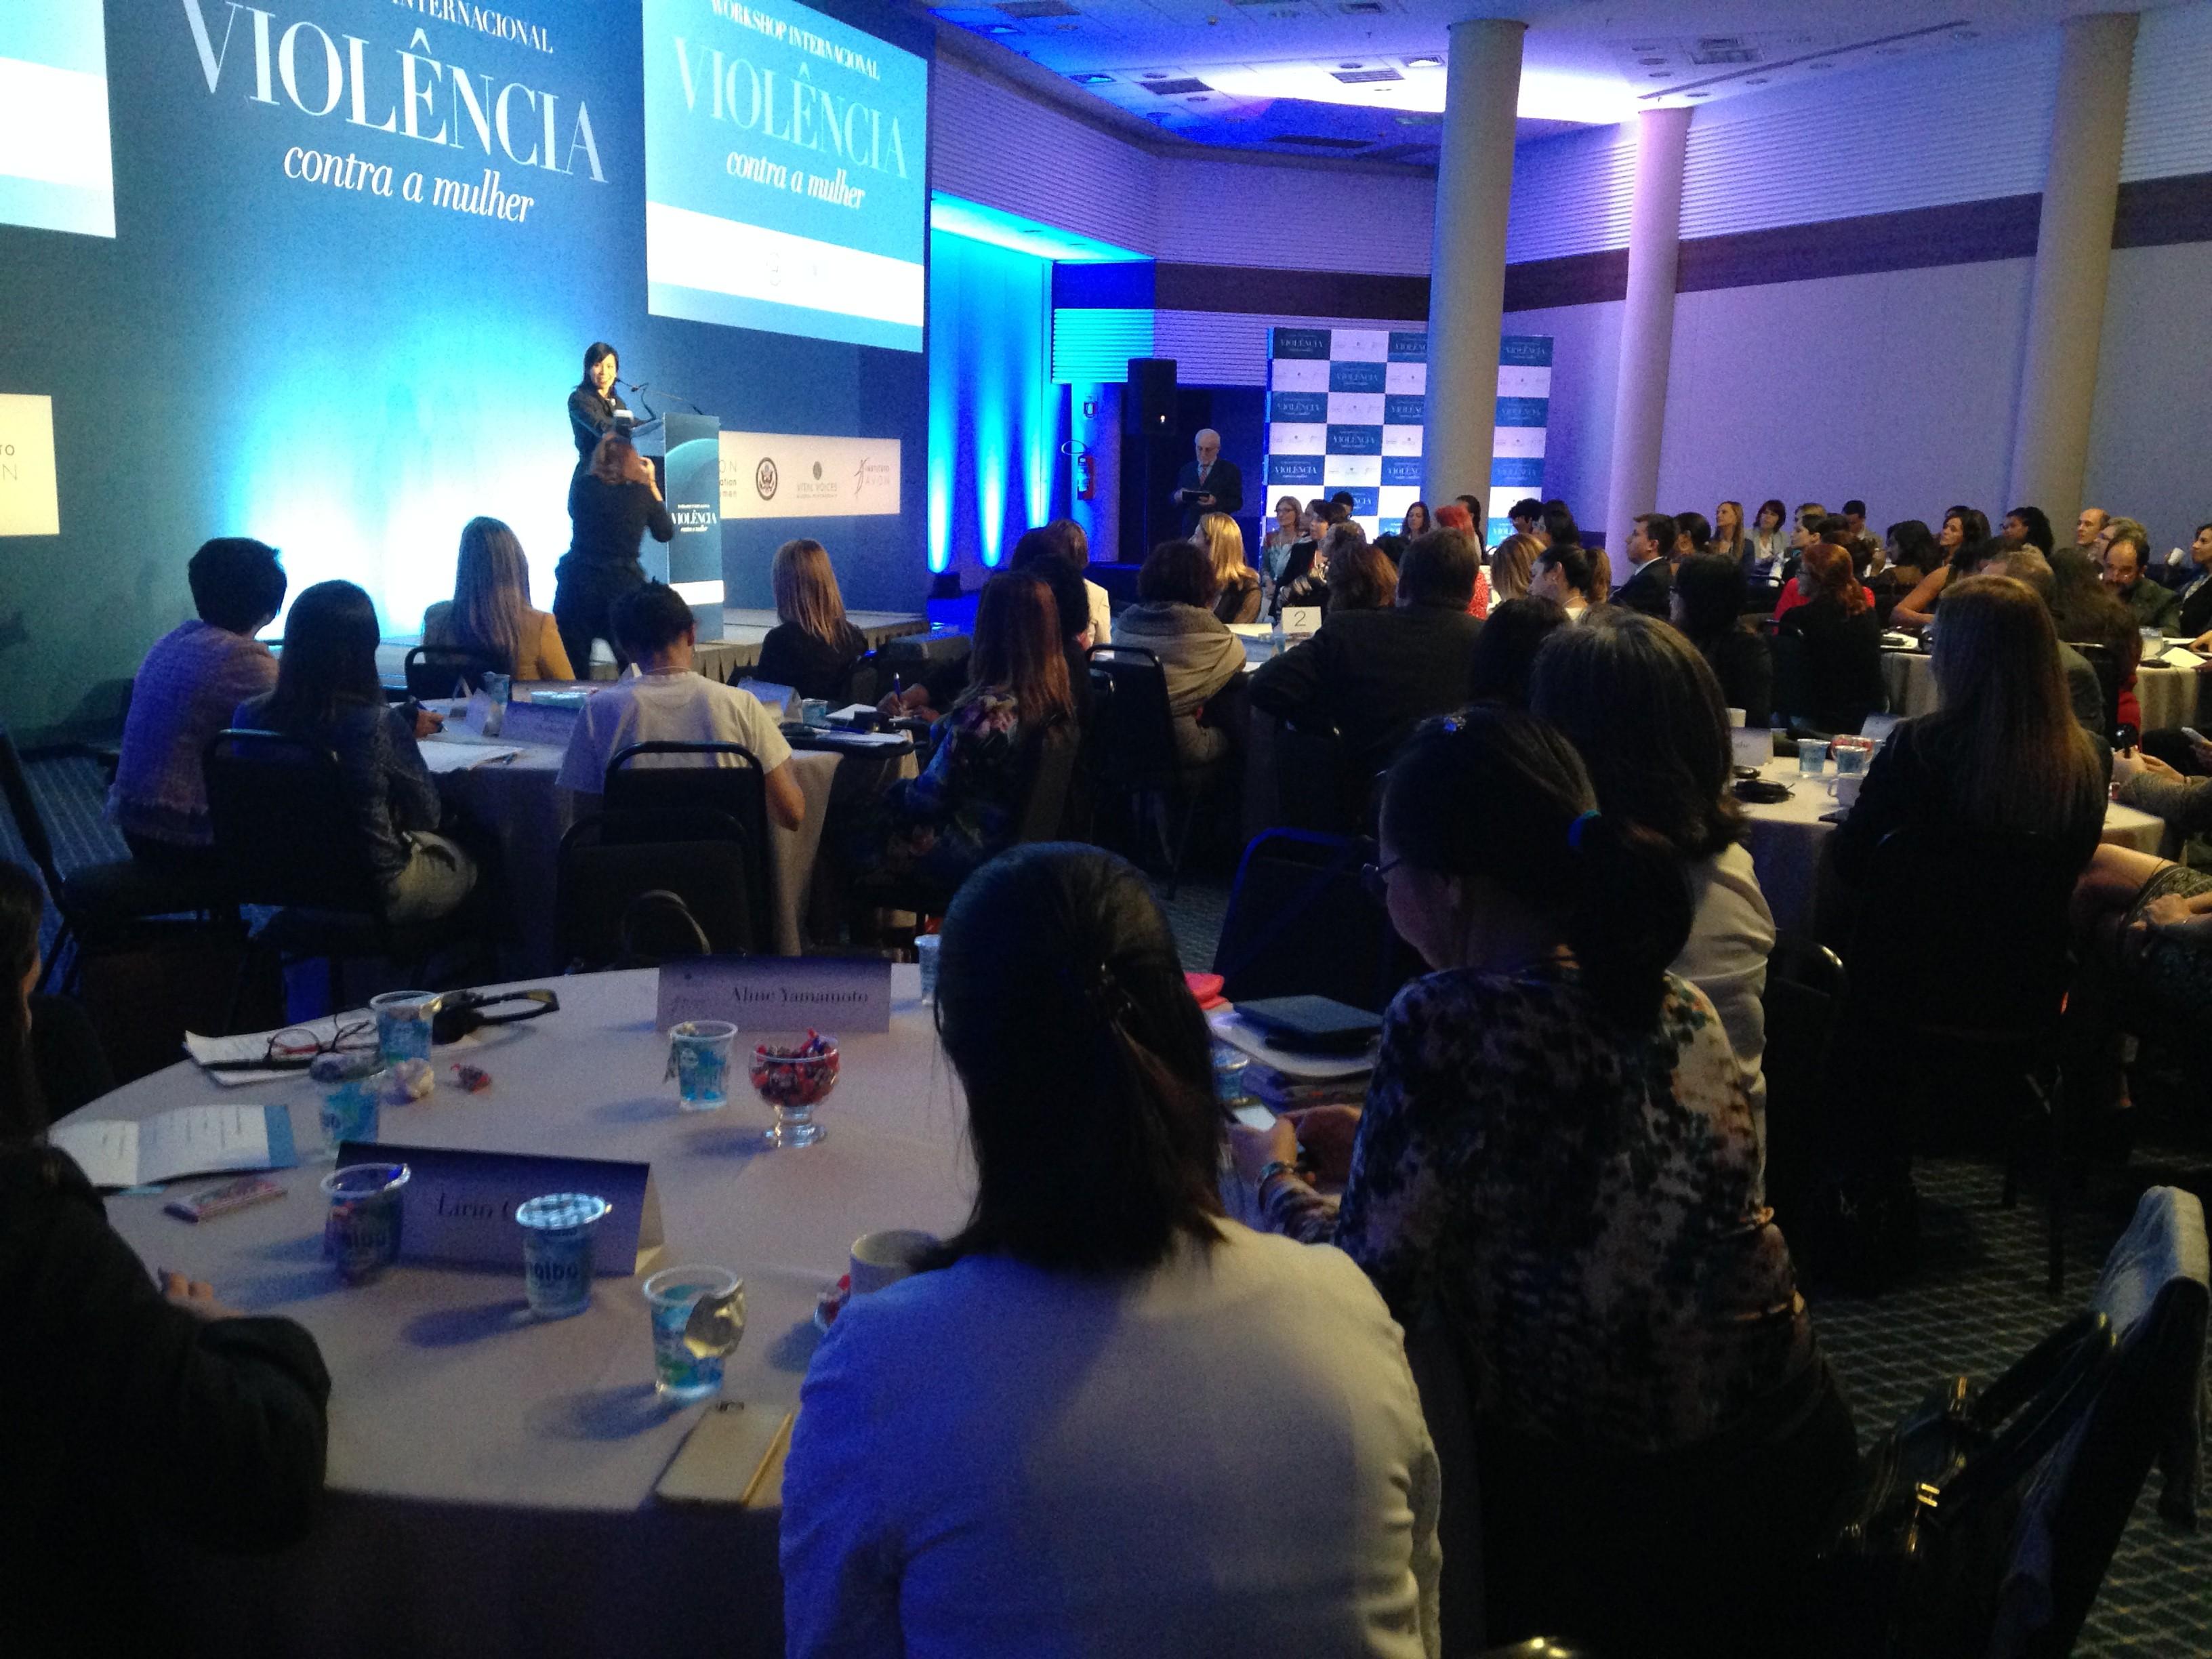 abertura do workshop internacional sobre violencia contra as mulheres - Aline Yamamoto